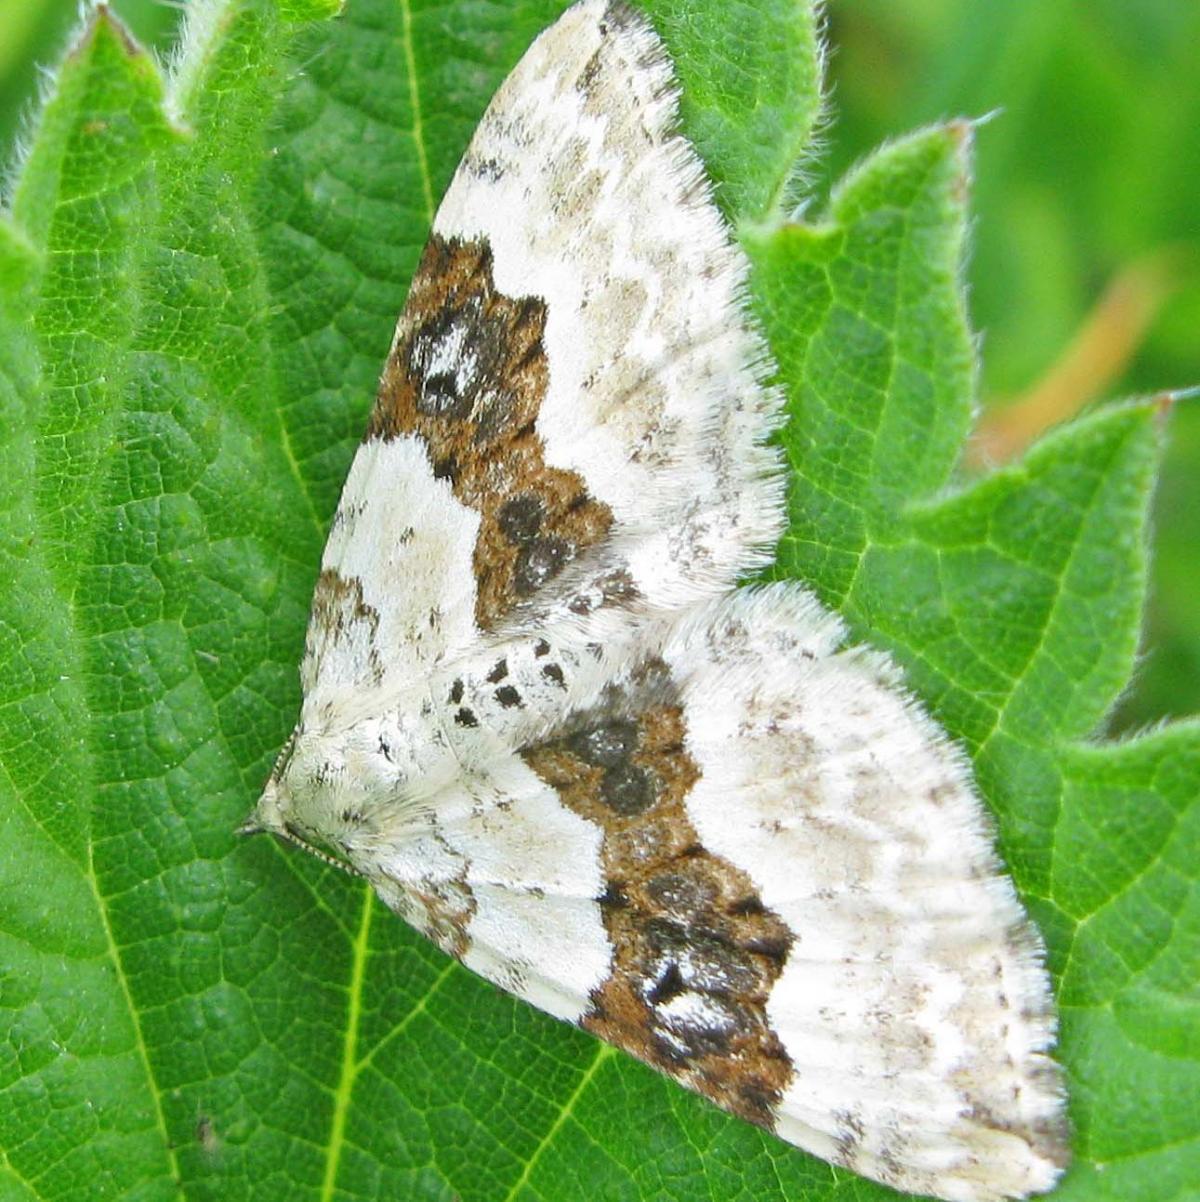 40 Year Moth Study